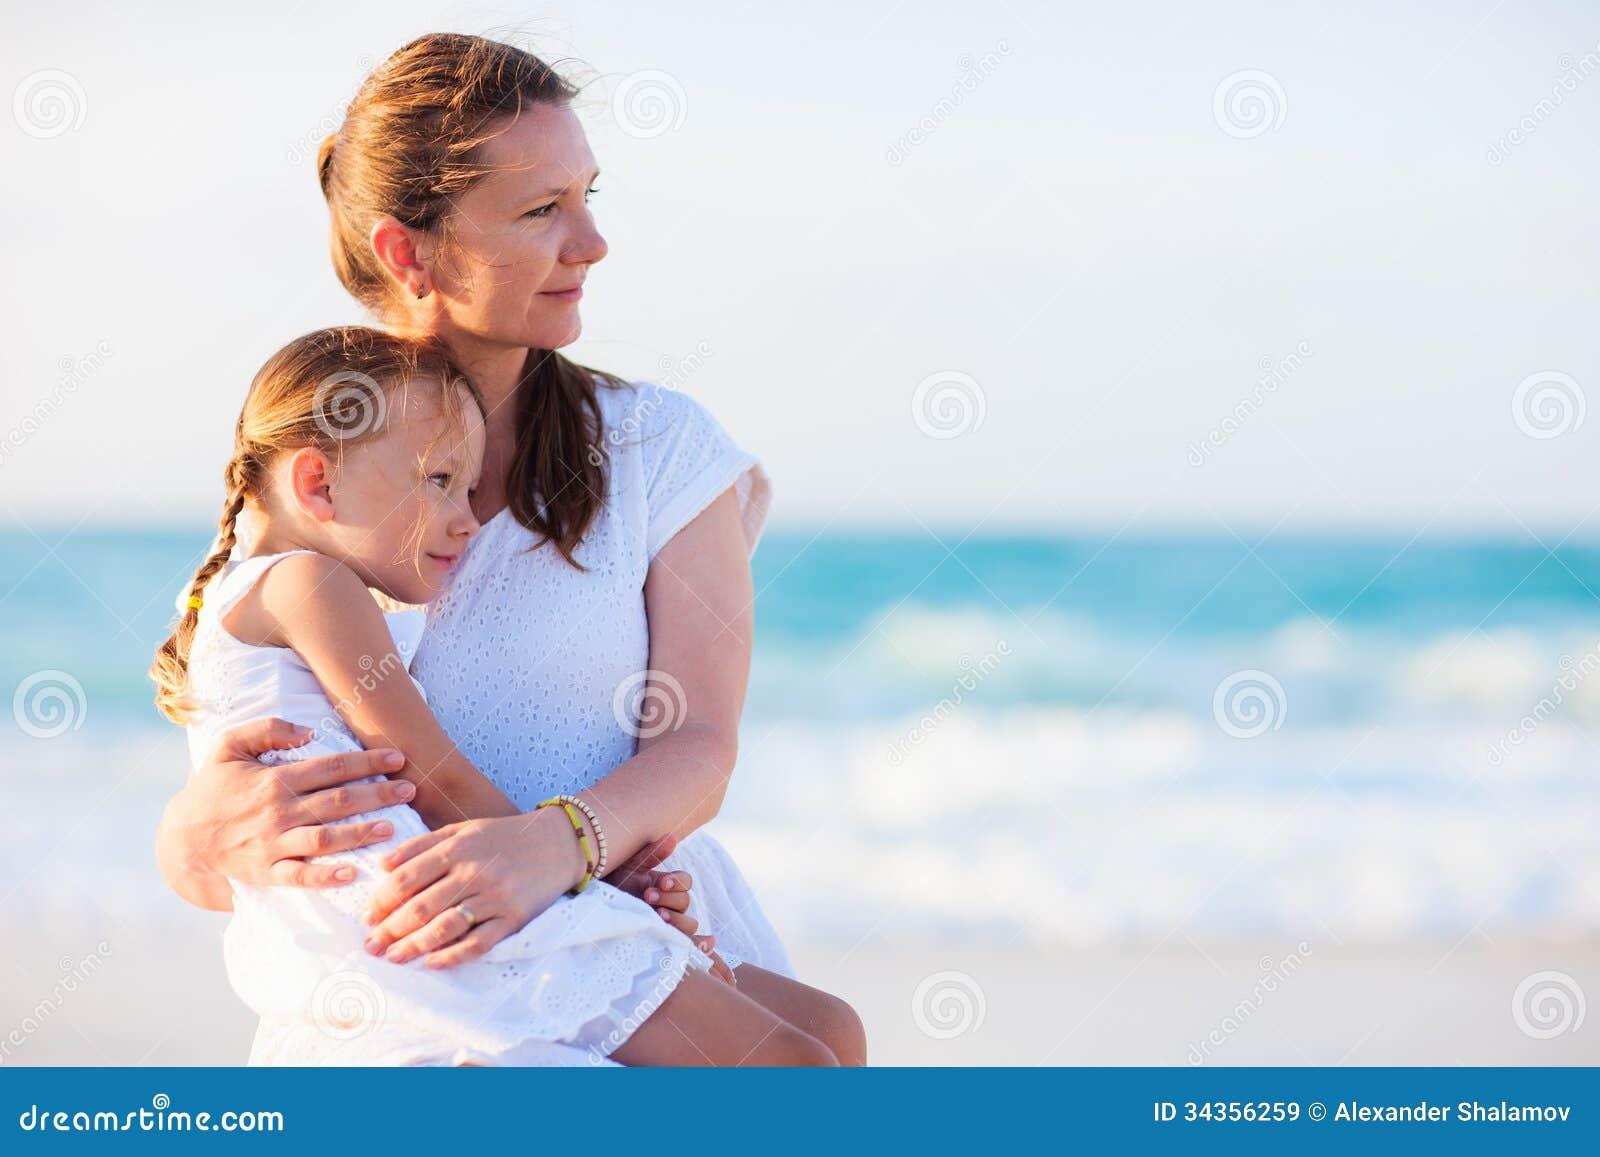 beliebtesten mutter tochter strand